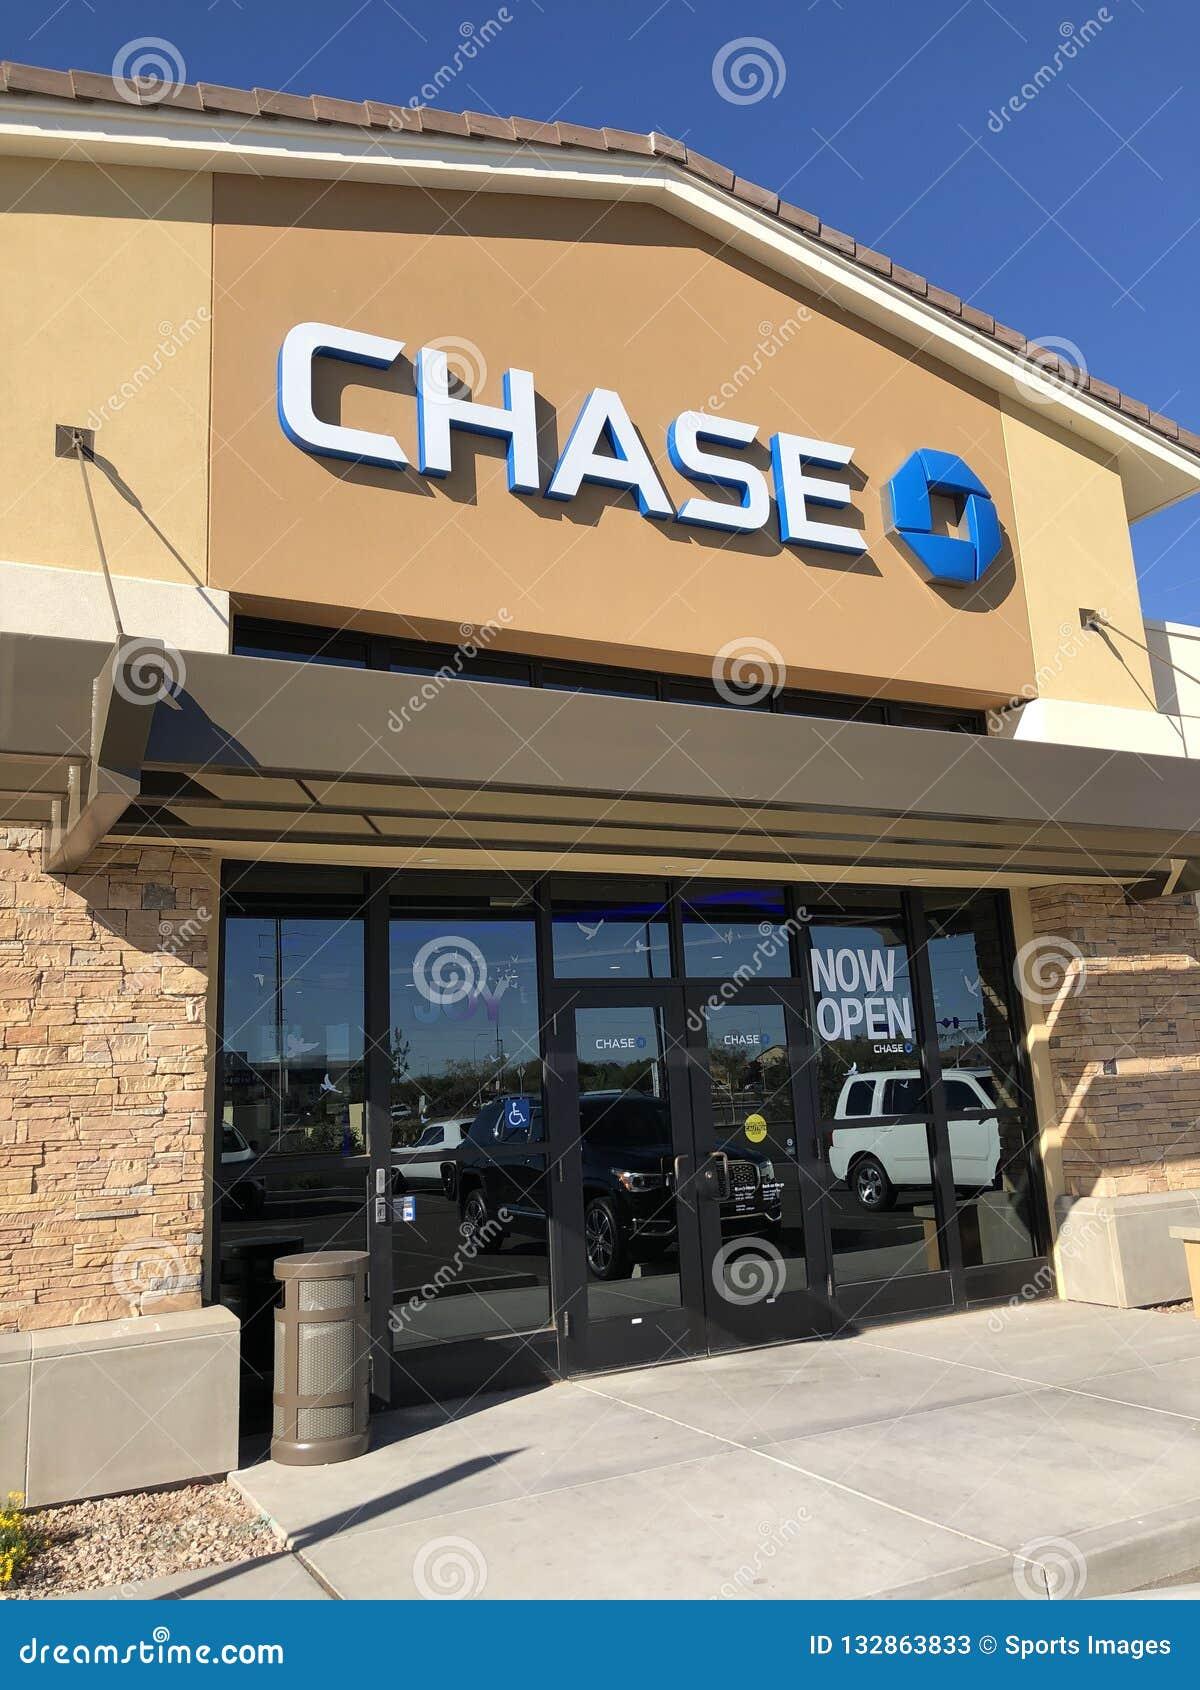 Chase Bank  editorial stock photo  Image of generosity - 132863833